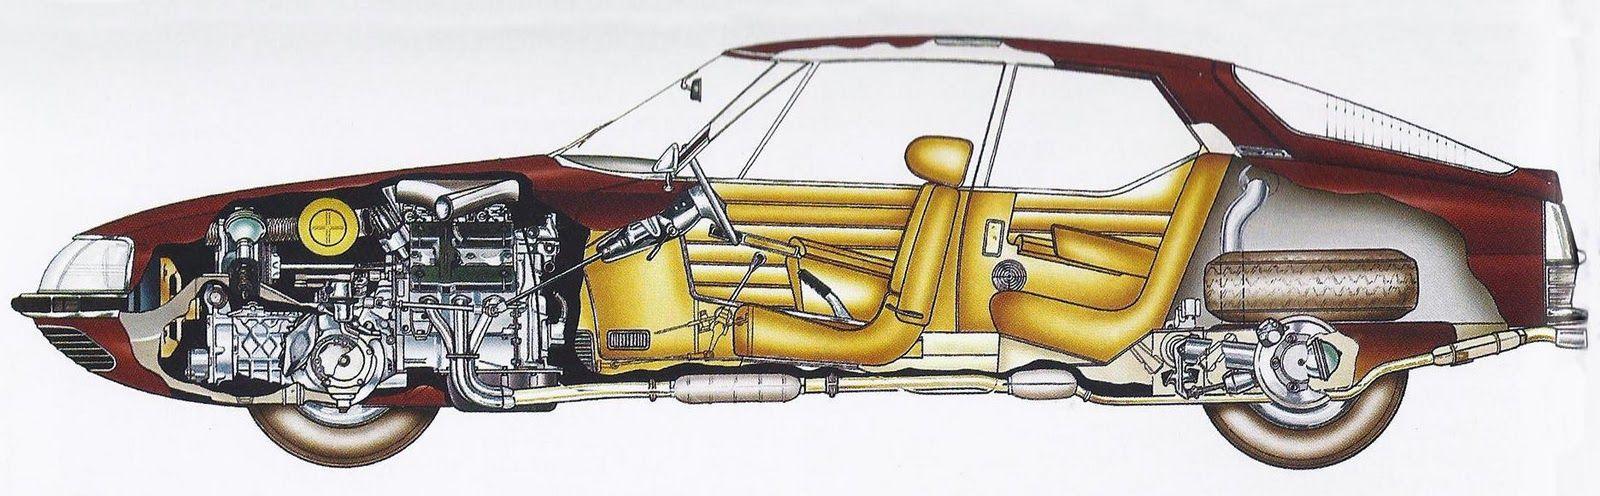 Citroen Sm Cutaway Diagrams Machine Pinterest Cars Engine